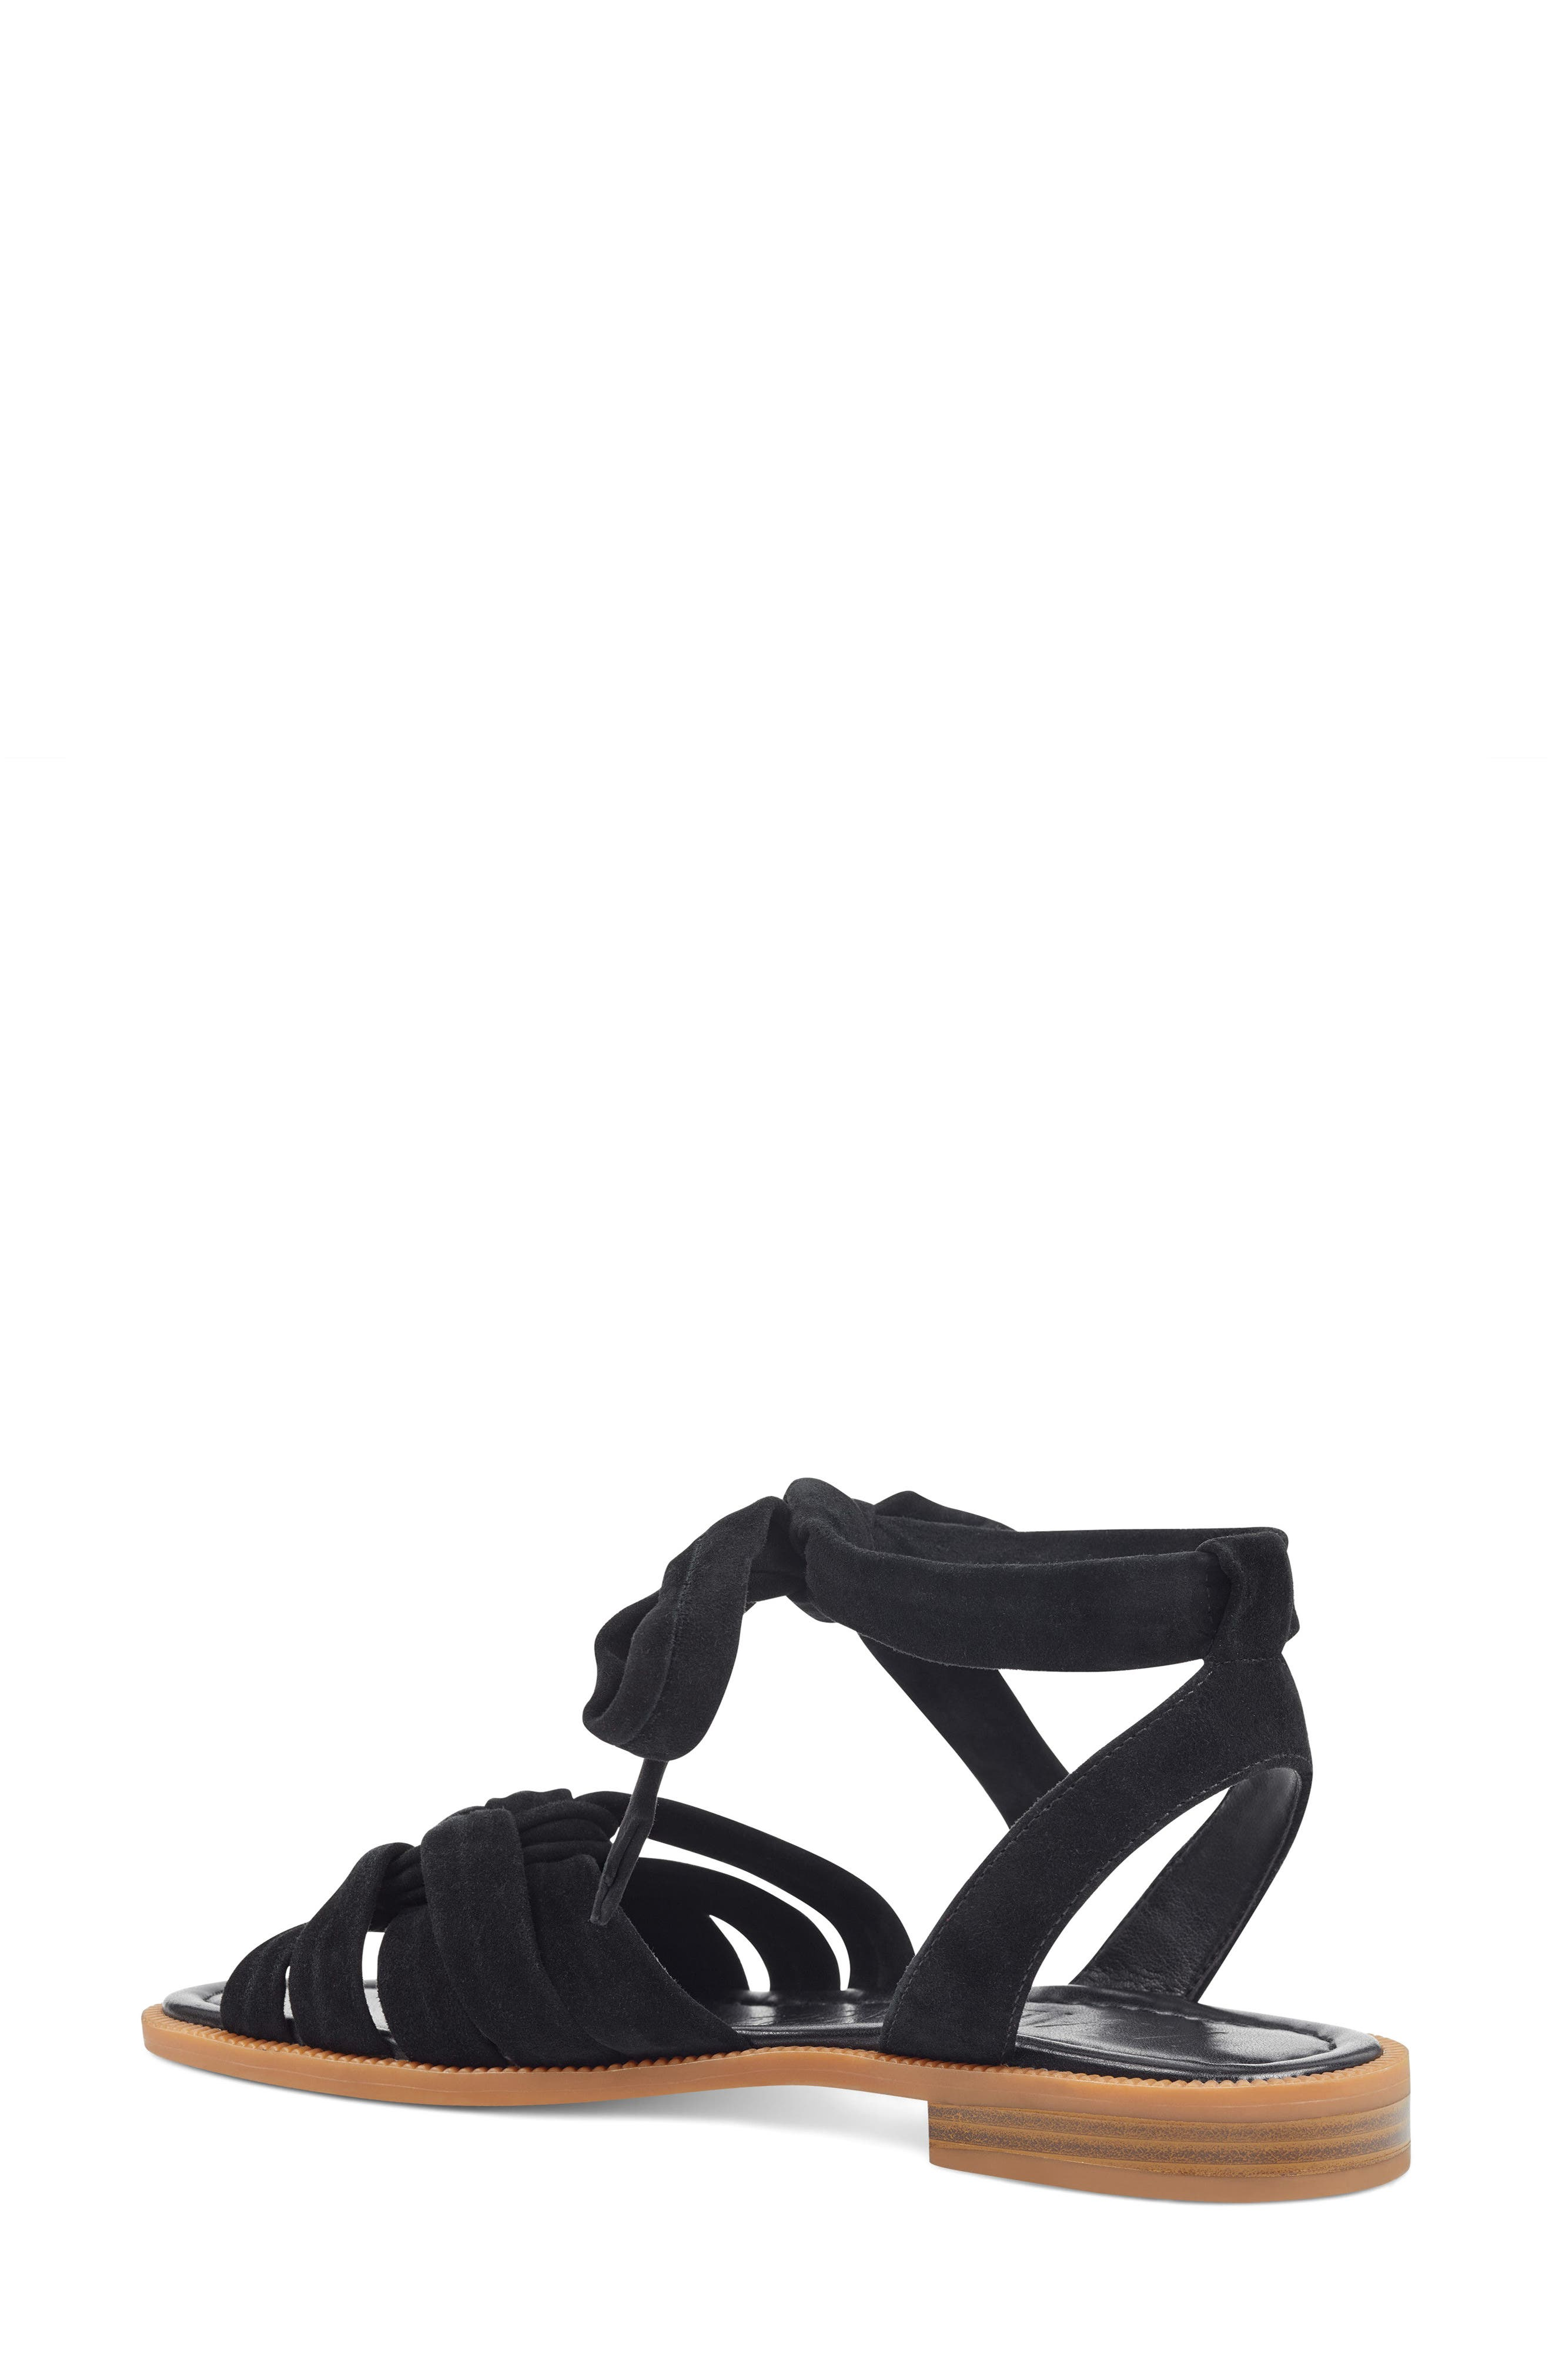 Xameera Knotted Sandal,                             Alternate thumbnail 2, color,                             002